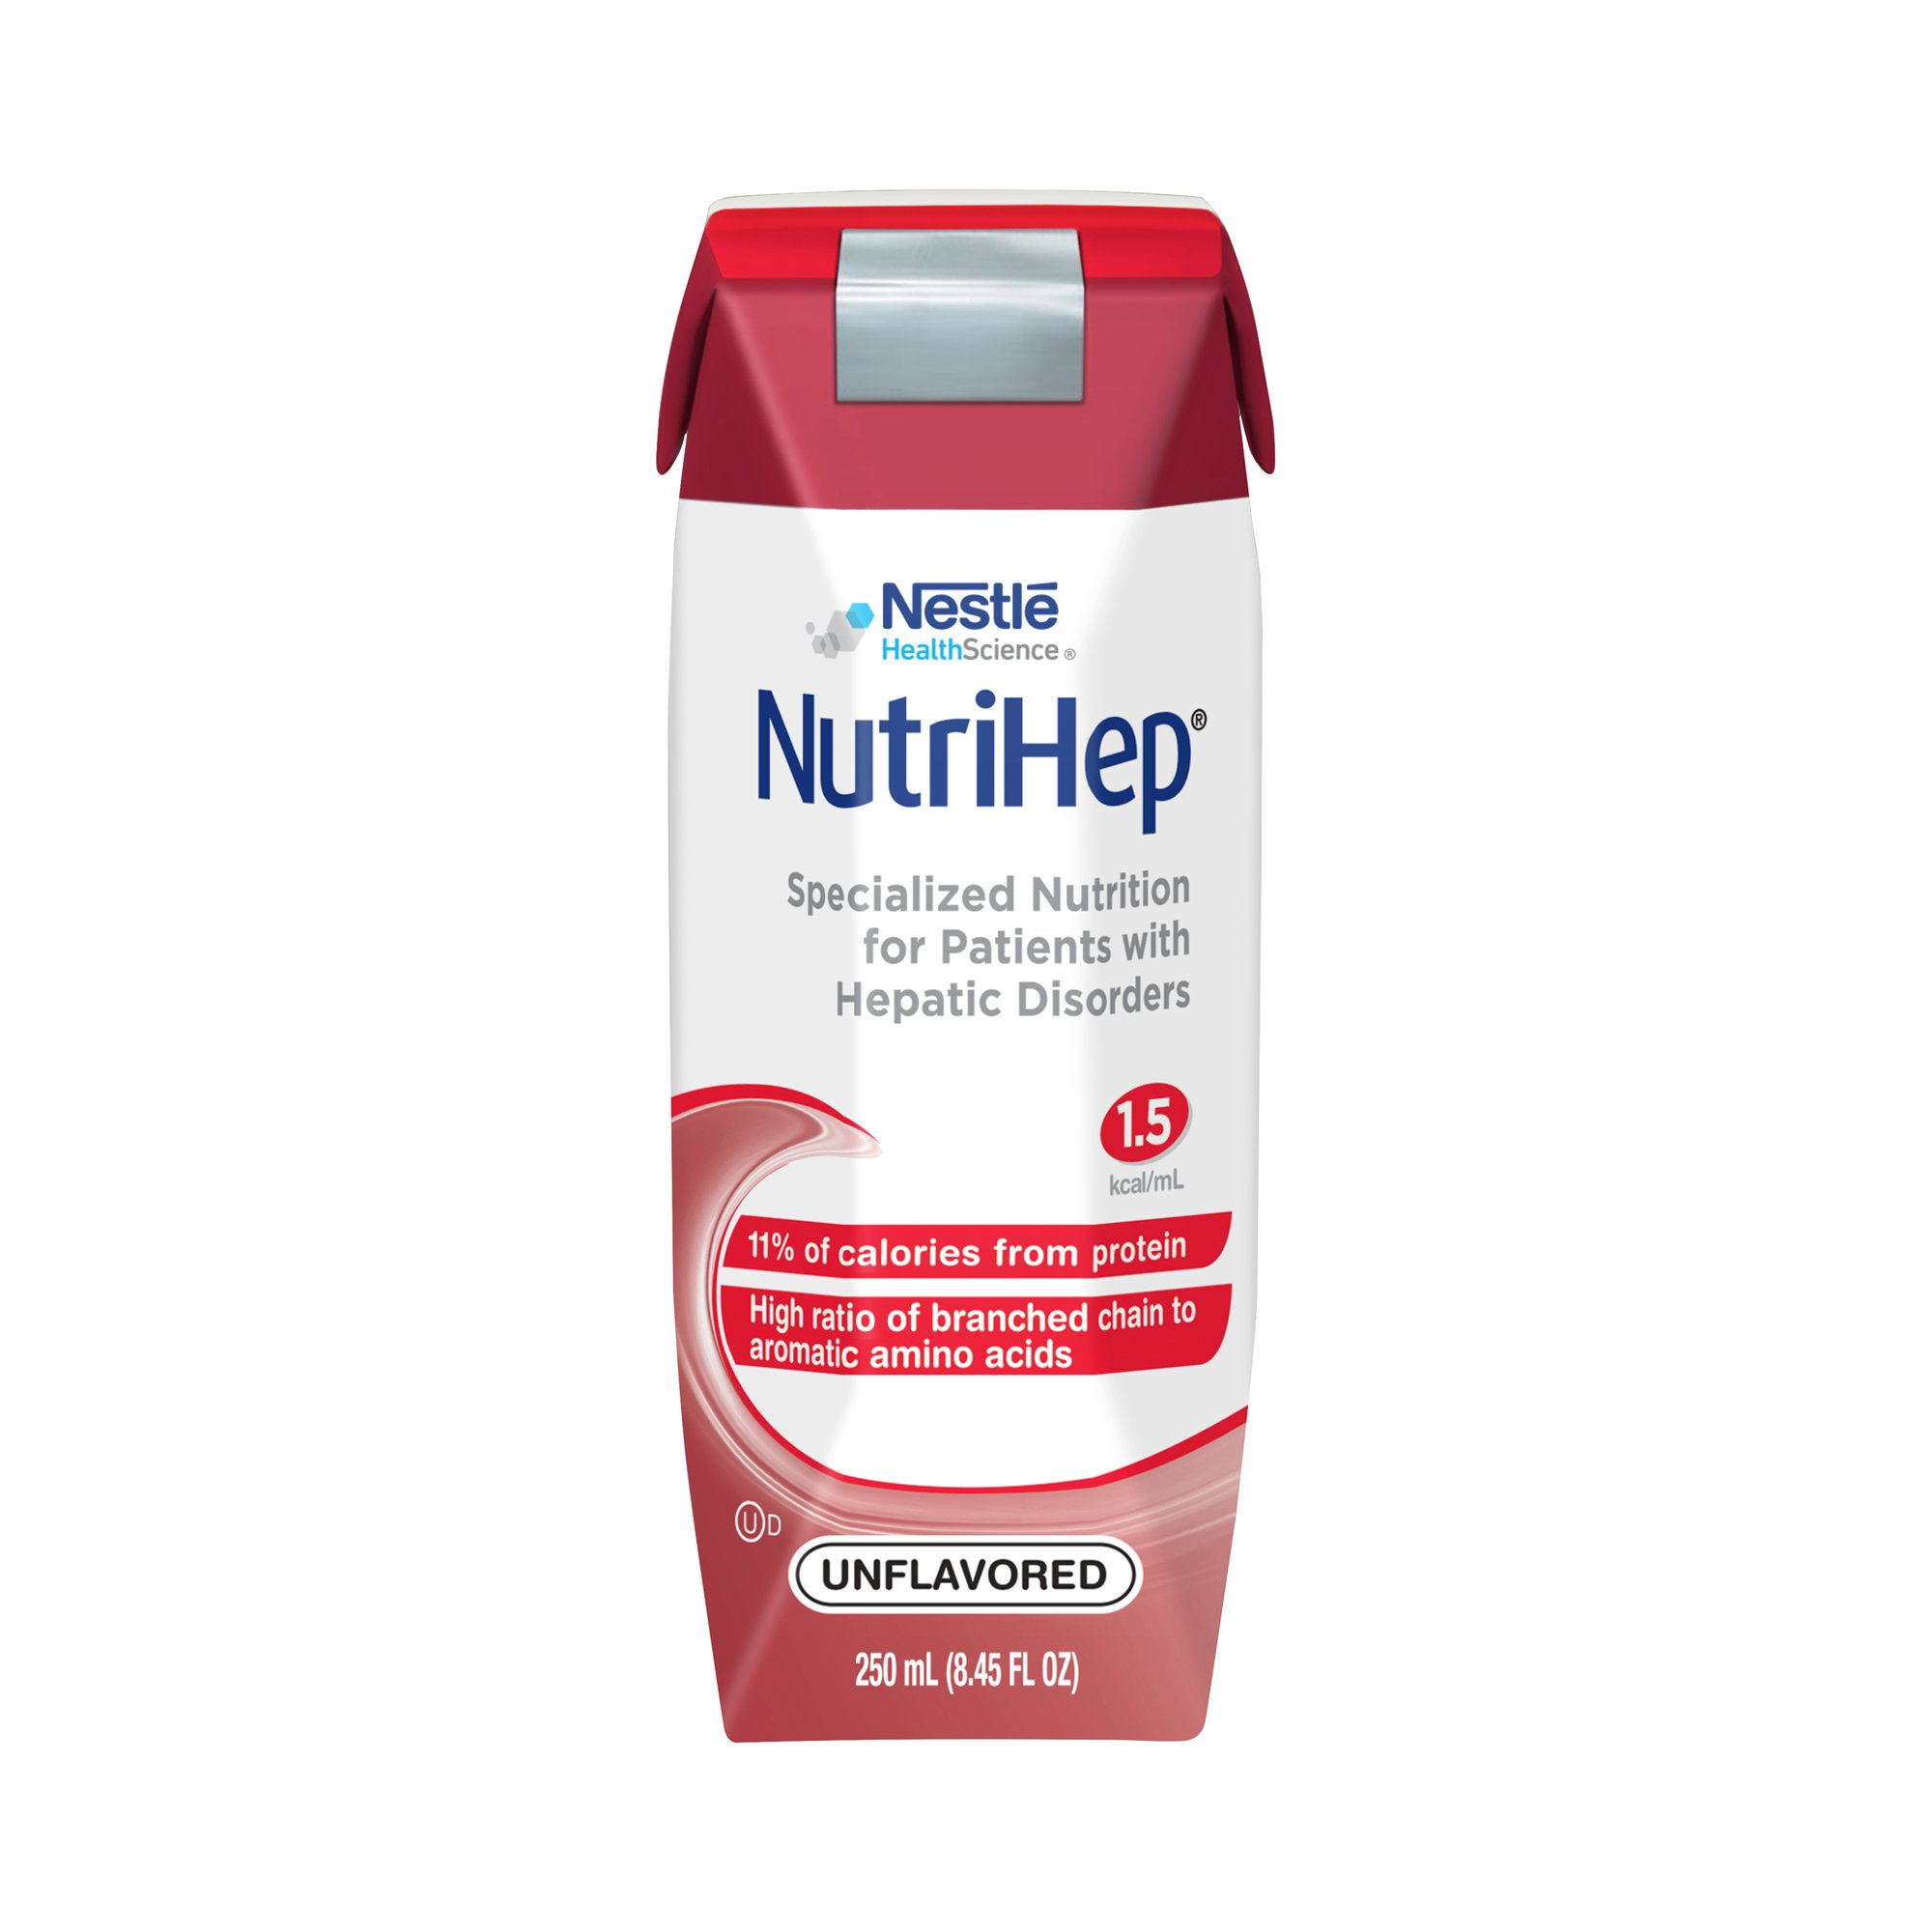 Nestle HealthScience NutriHep Specialized Nutrition Tube Feeding Formula, 8.45 oz, 9871616479, Case of 24